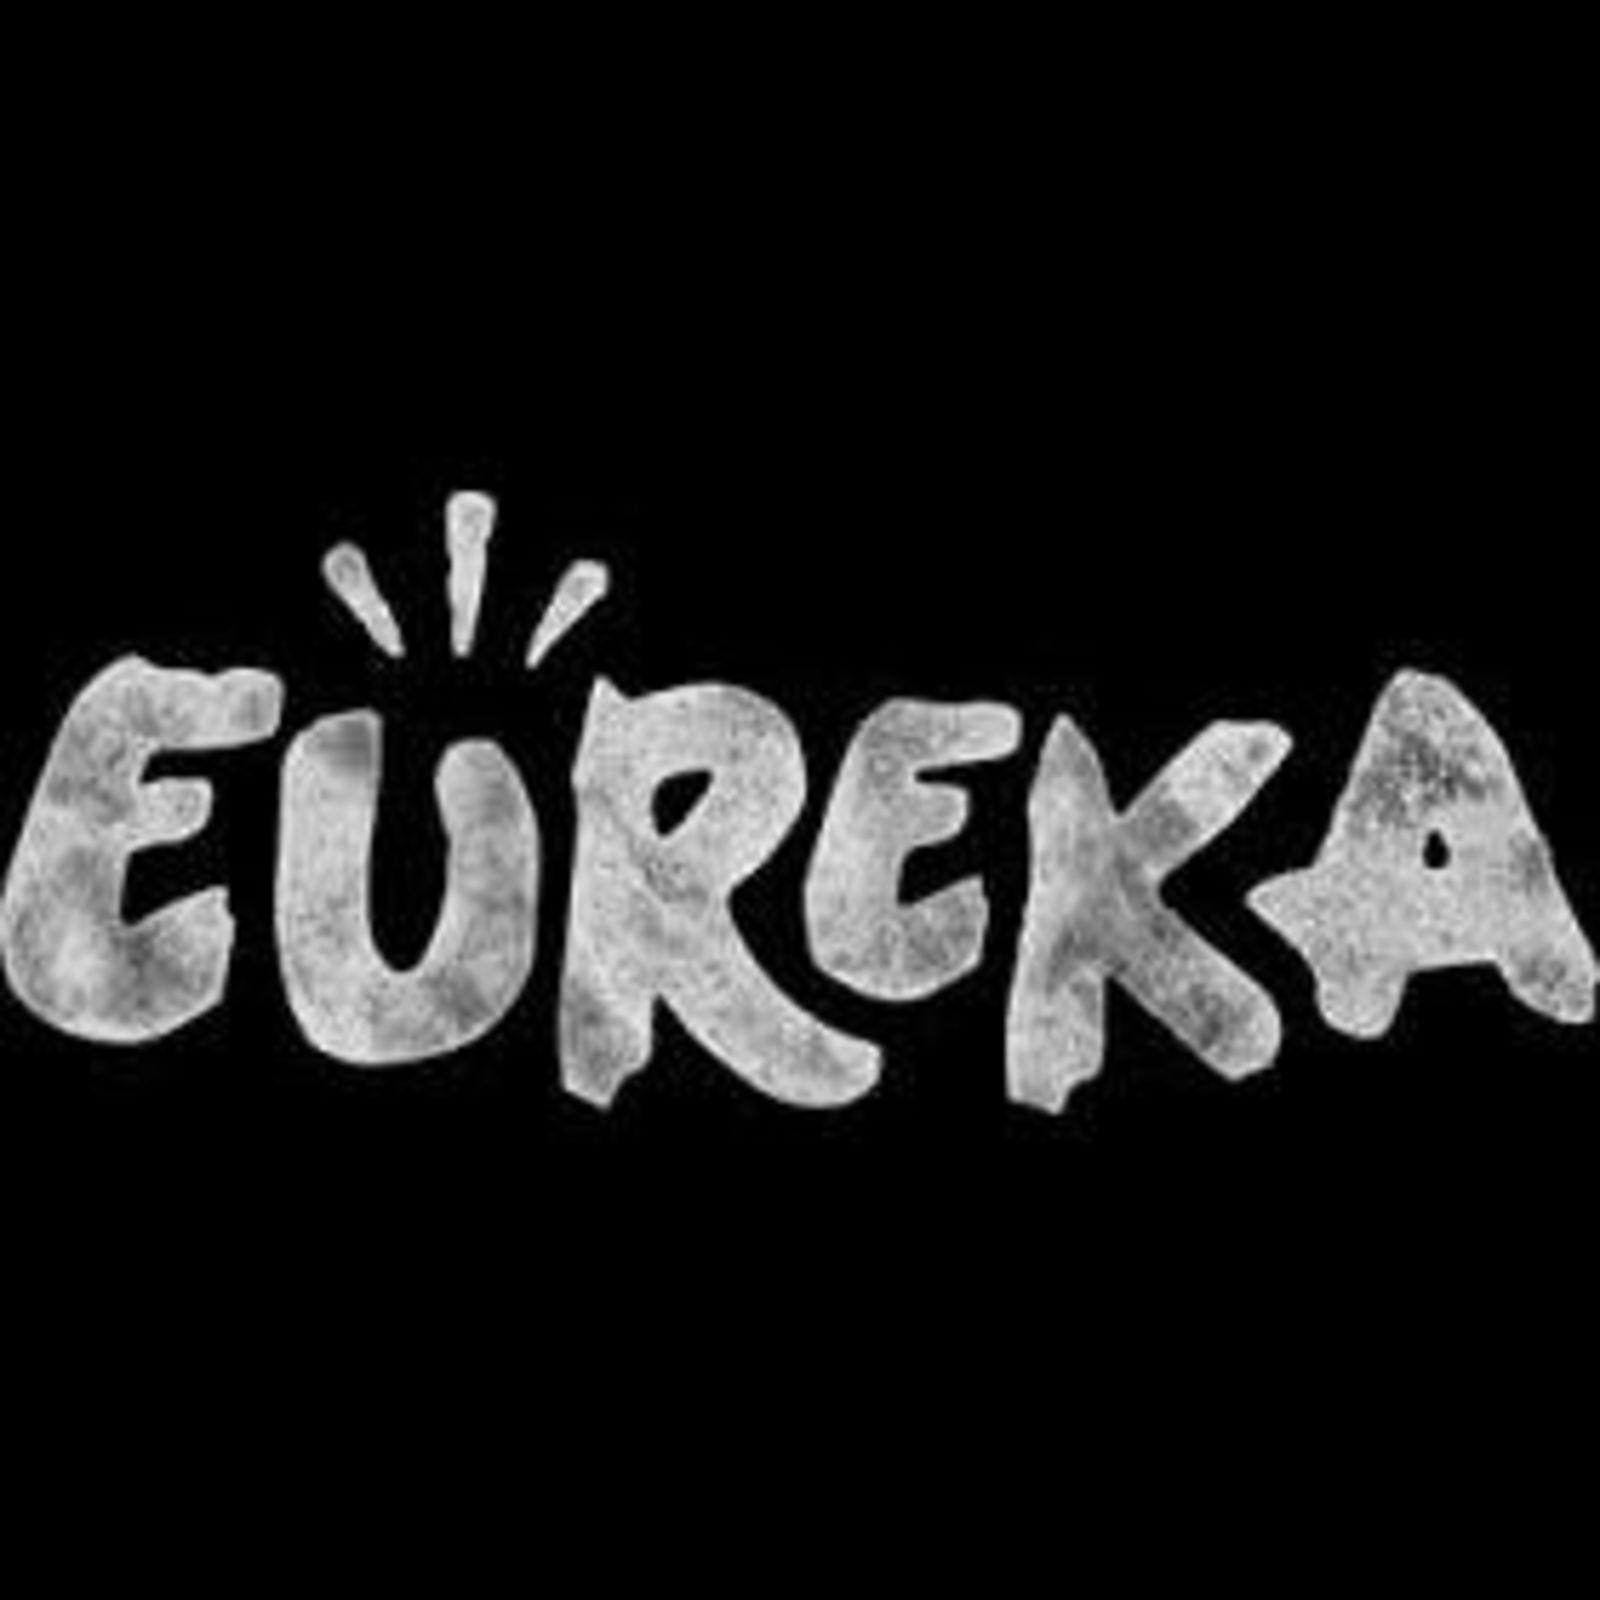 EUREKA kidswear